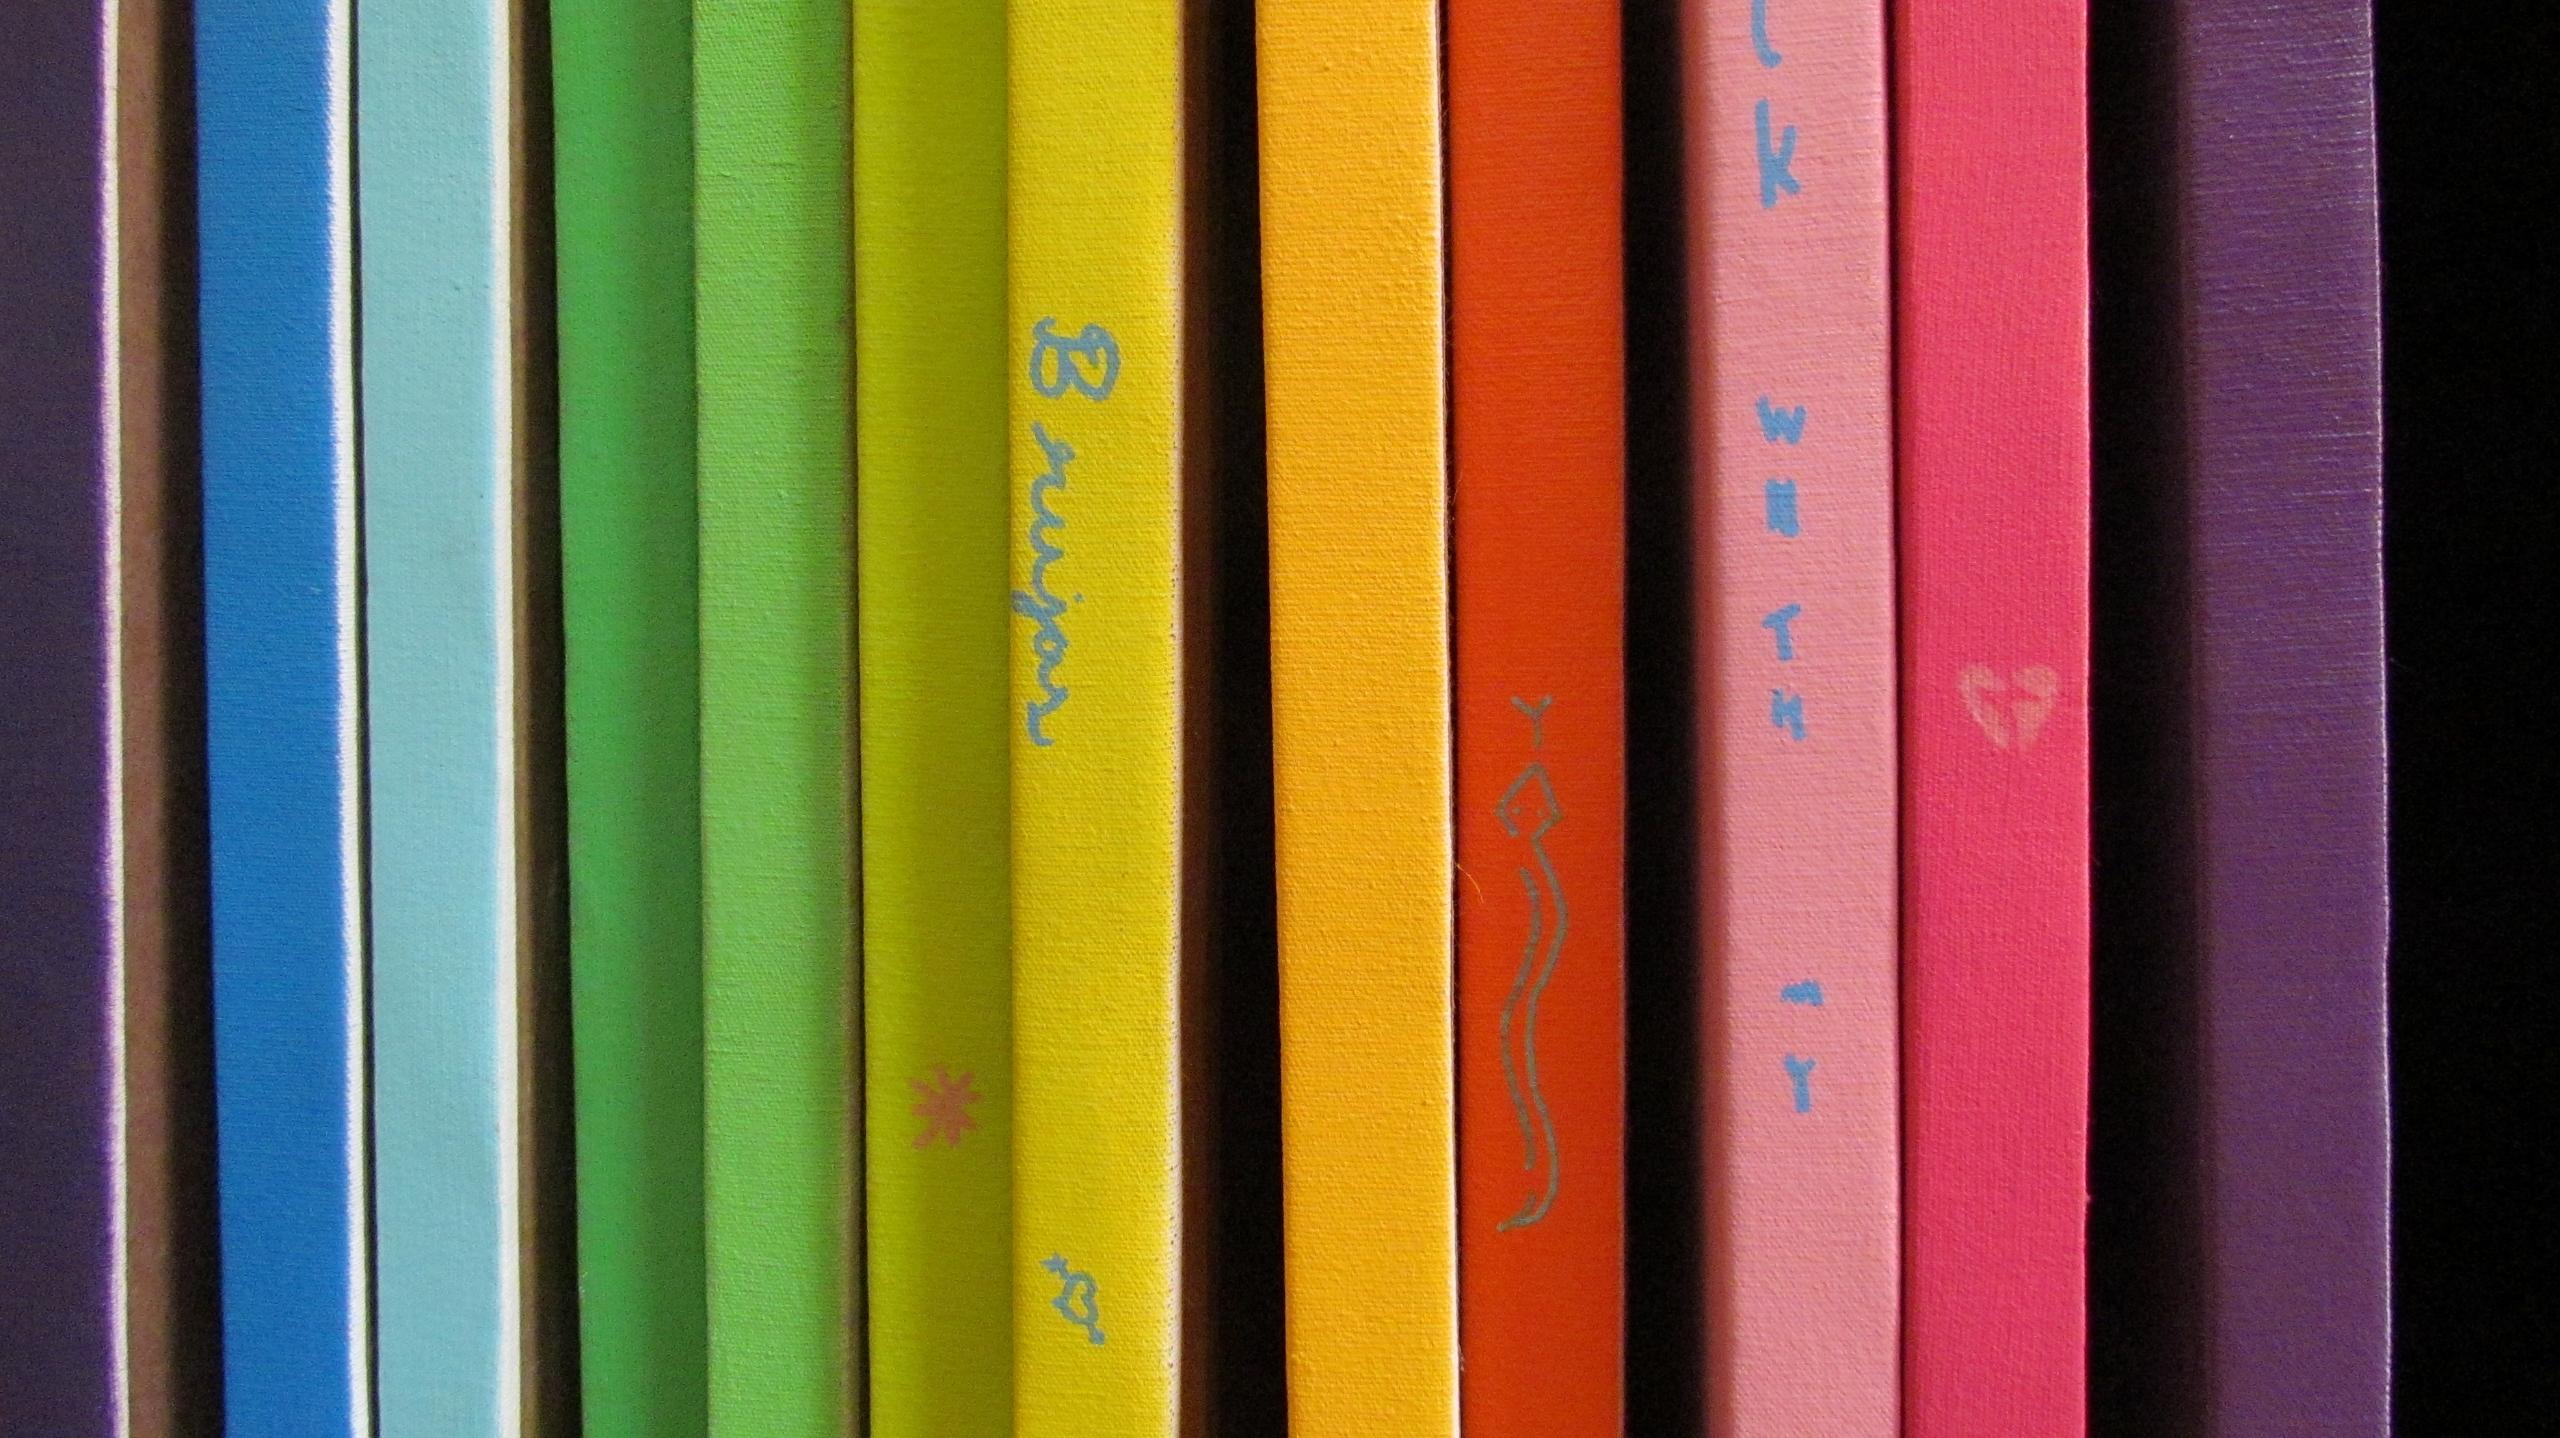 zapatoverde (@zapatoverde) Cover Image